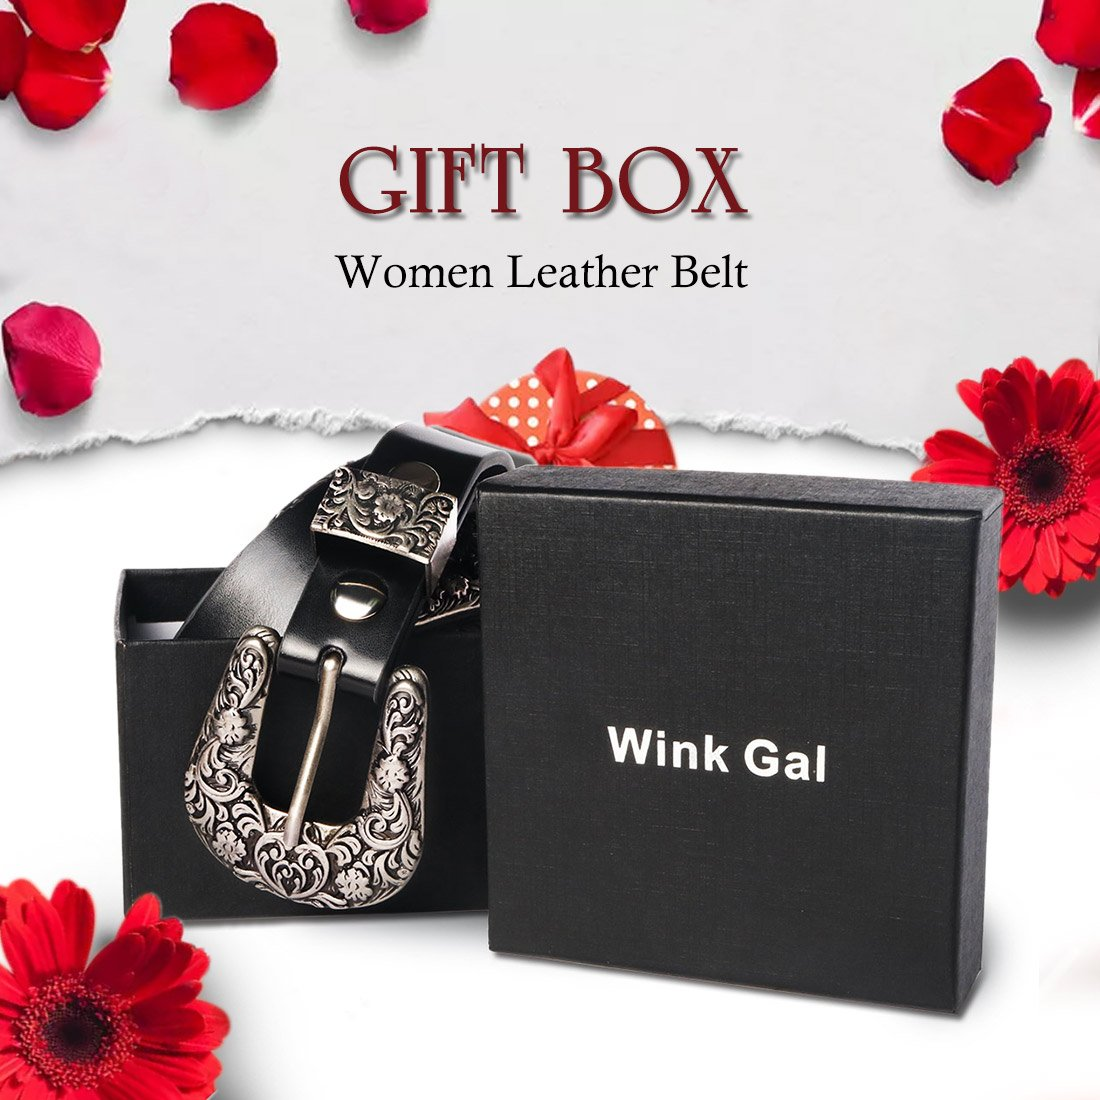 Wink Gal Women's Boho Metal Western Double Buckle Belt Sliver (Suit pants size 31''-34''(US size 12-16), Rivet Width Approx. 1'') by Wink Gal (Image #5)